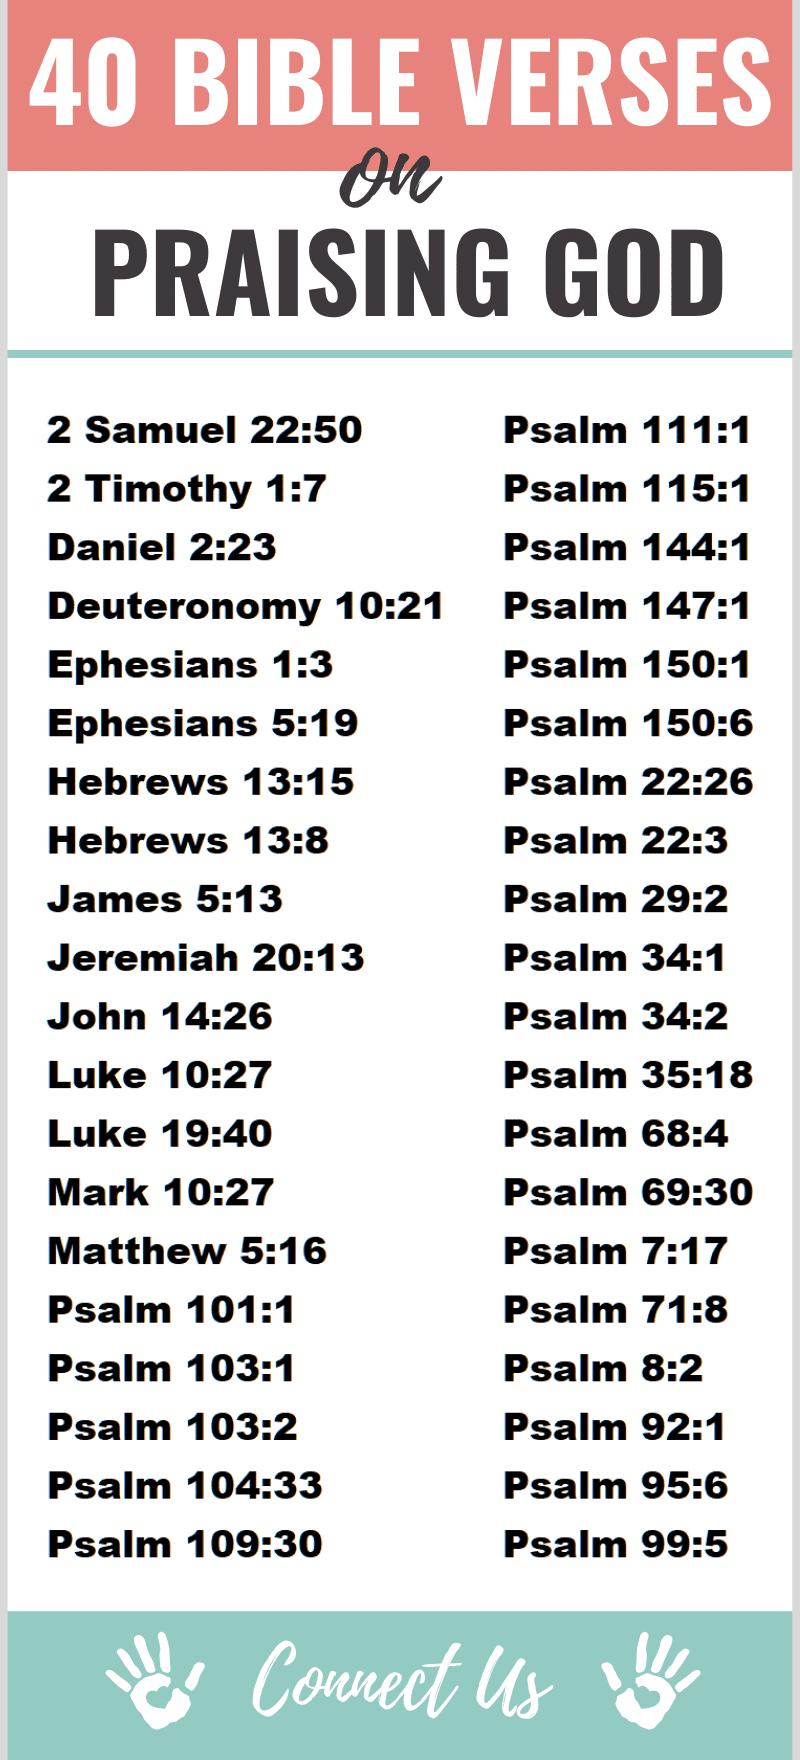 Bible Verses on Praising God